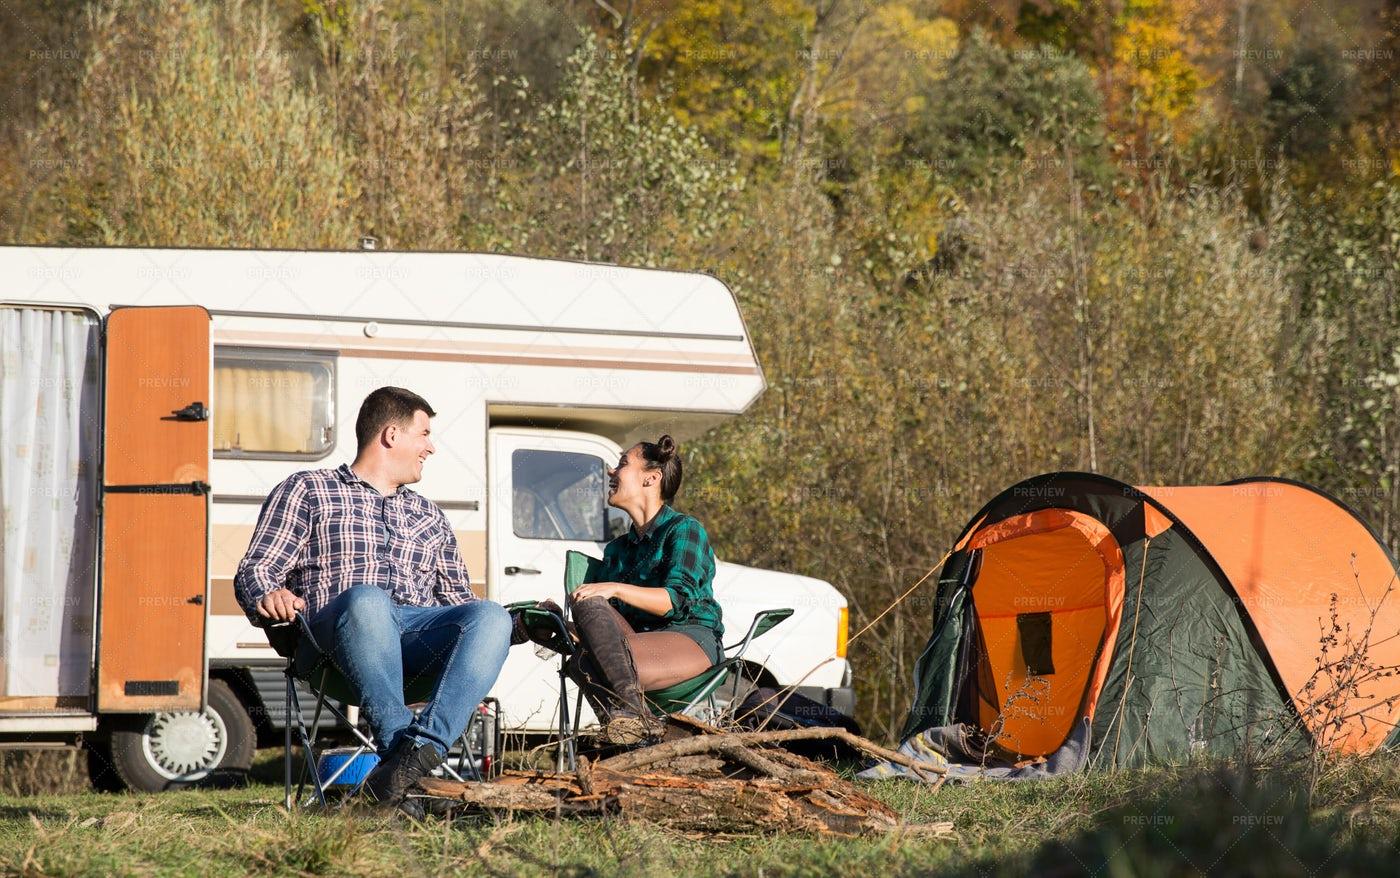 Camping In Autumn: Stock Photos